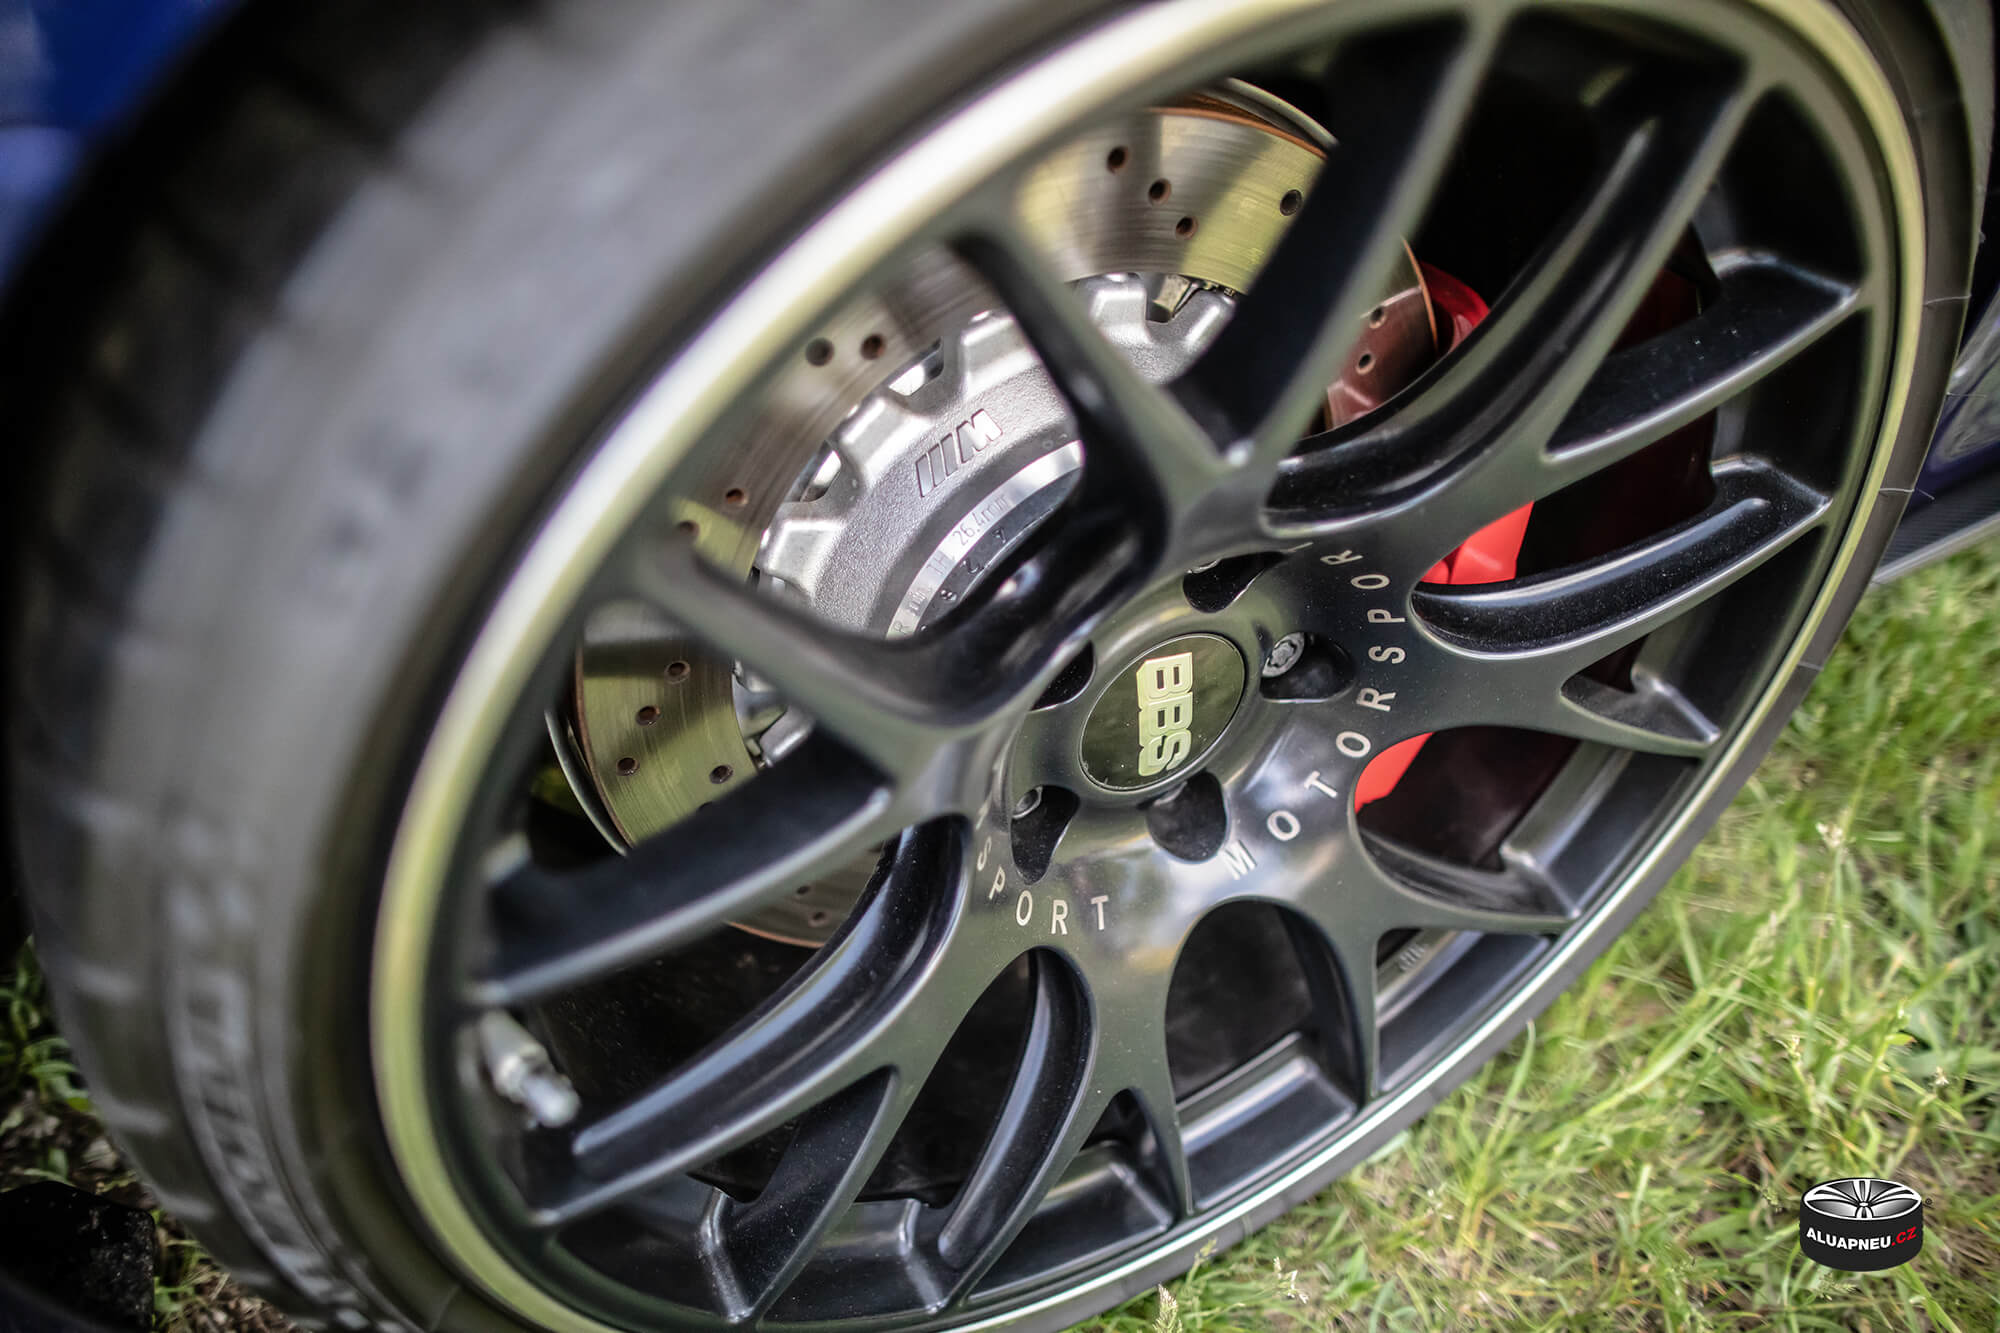 Černá alu kola BBS Motorsport - Automobilové Legendy 2019 - www.aluapneu.cz